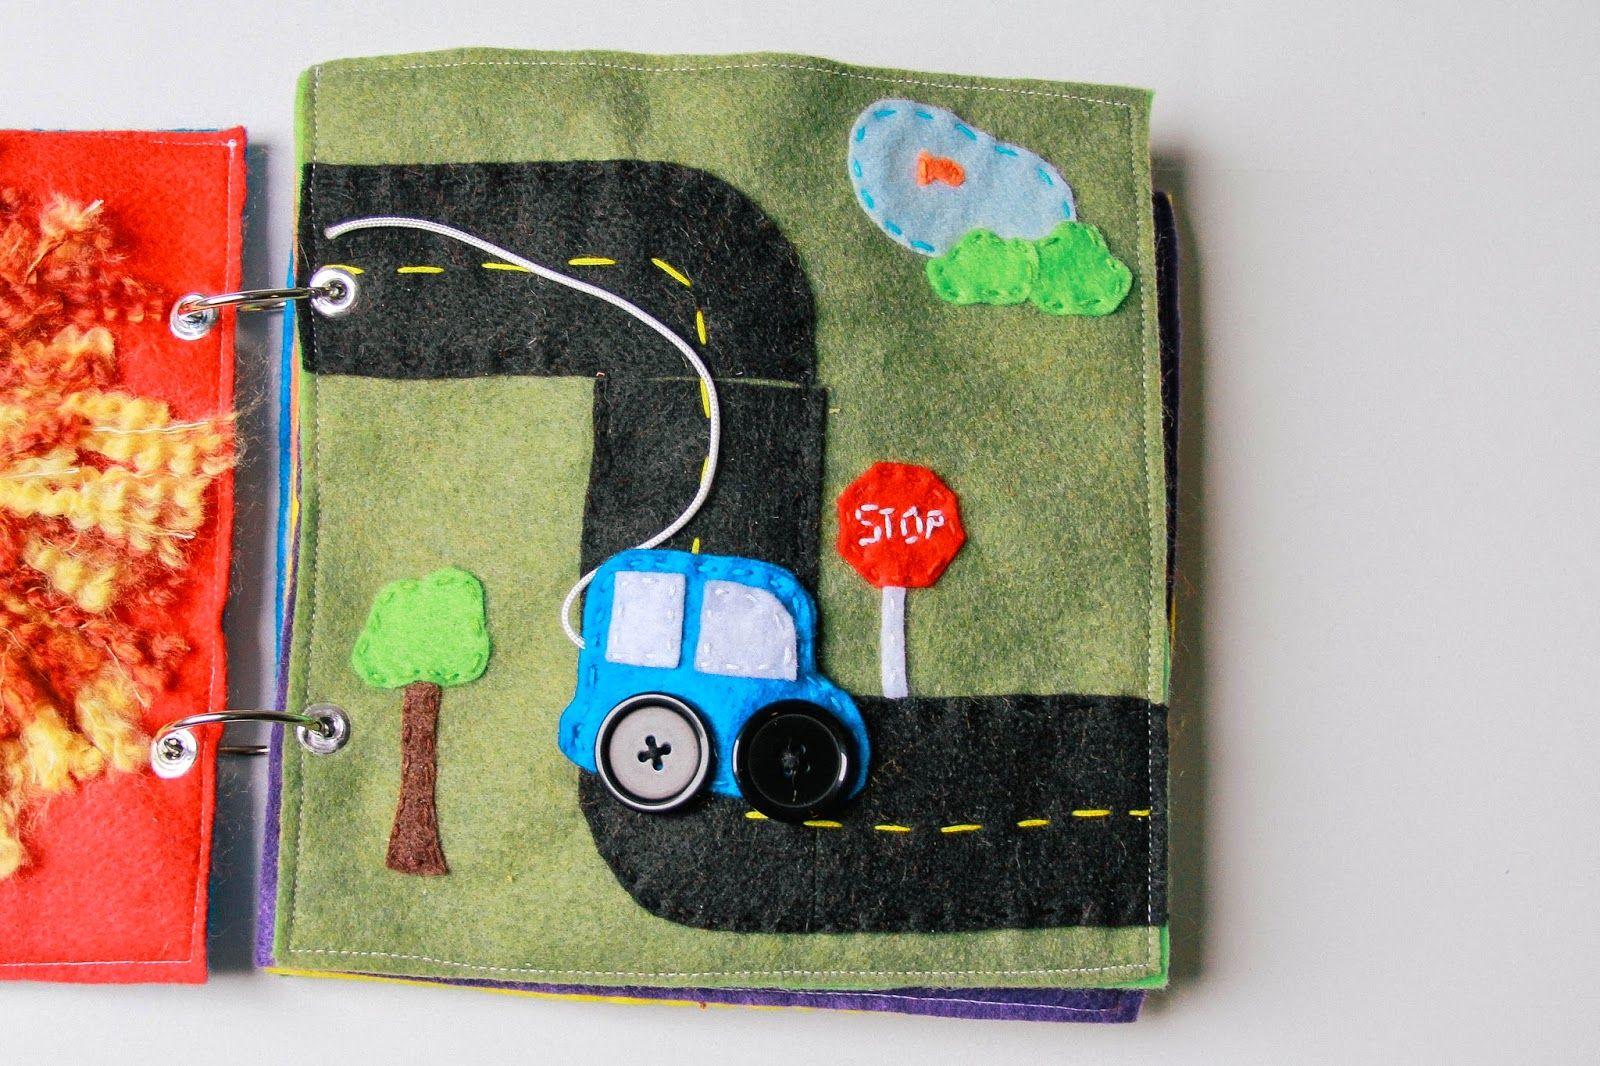 The hollenback bus quiet book diy busy book pinterest busy book the hollenback bus quiet book diy solutioingenieria Images